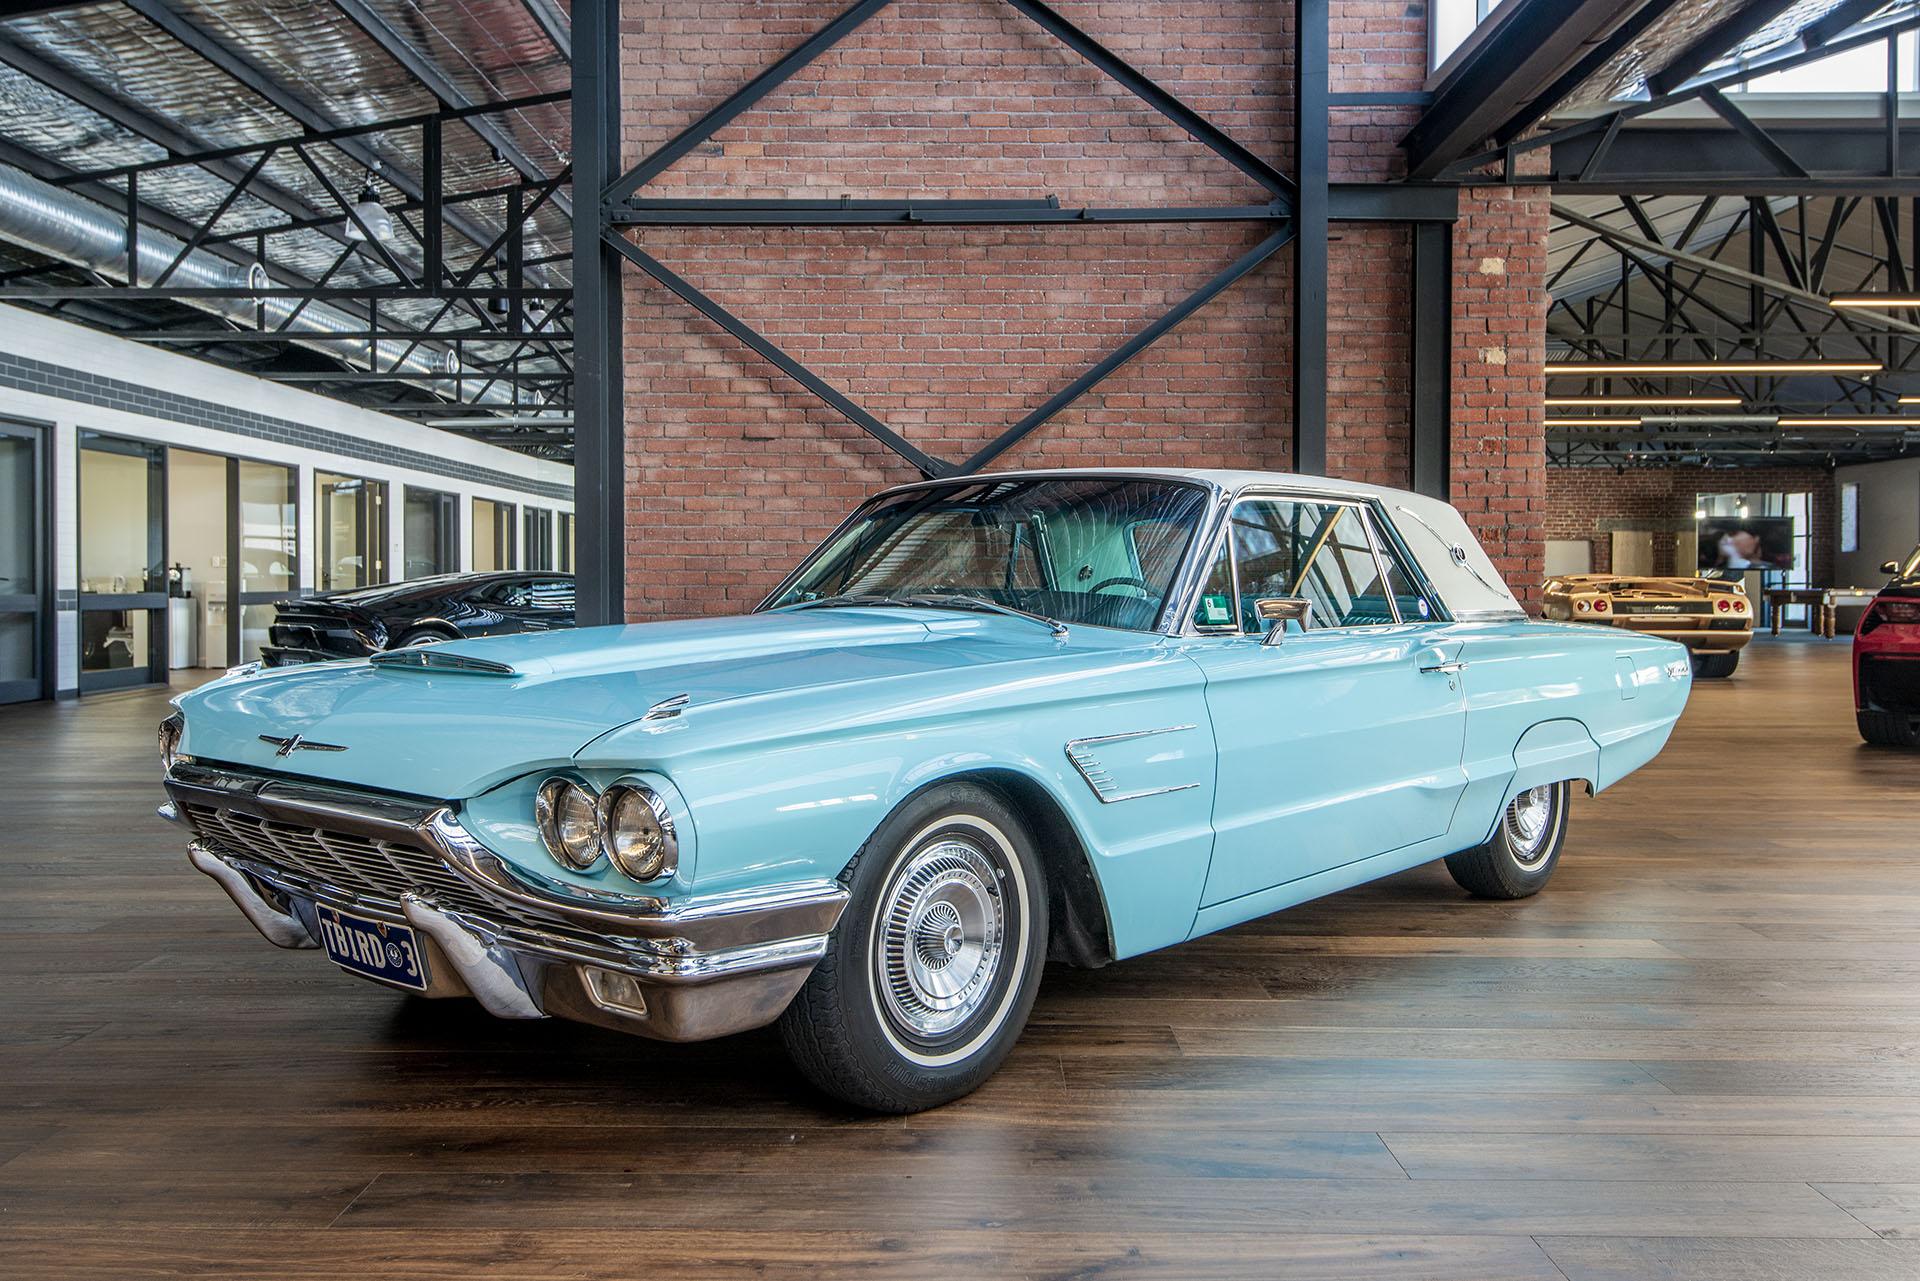 1965 Ford Thunderbird Hardtop - Richmonds - Classic and ...